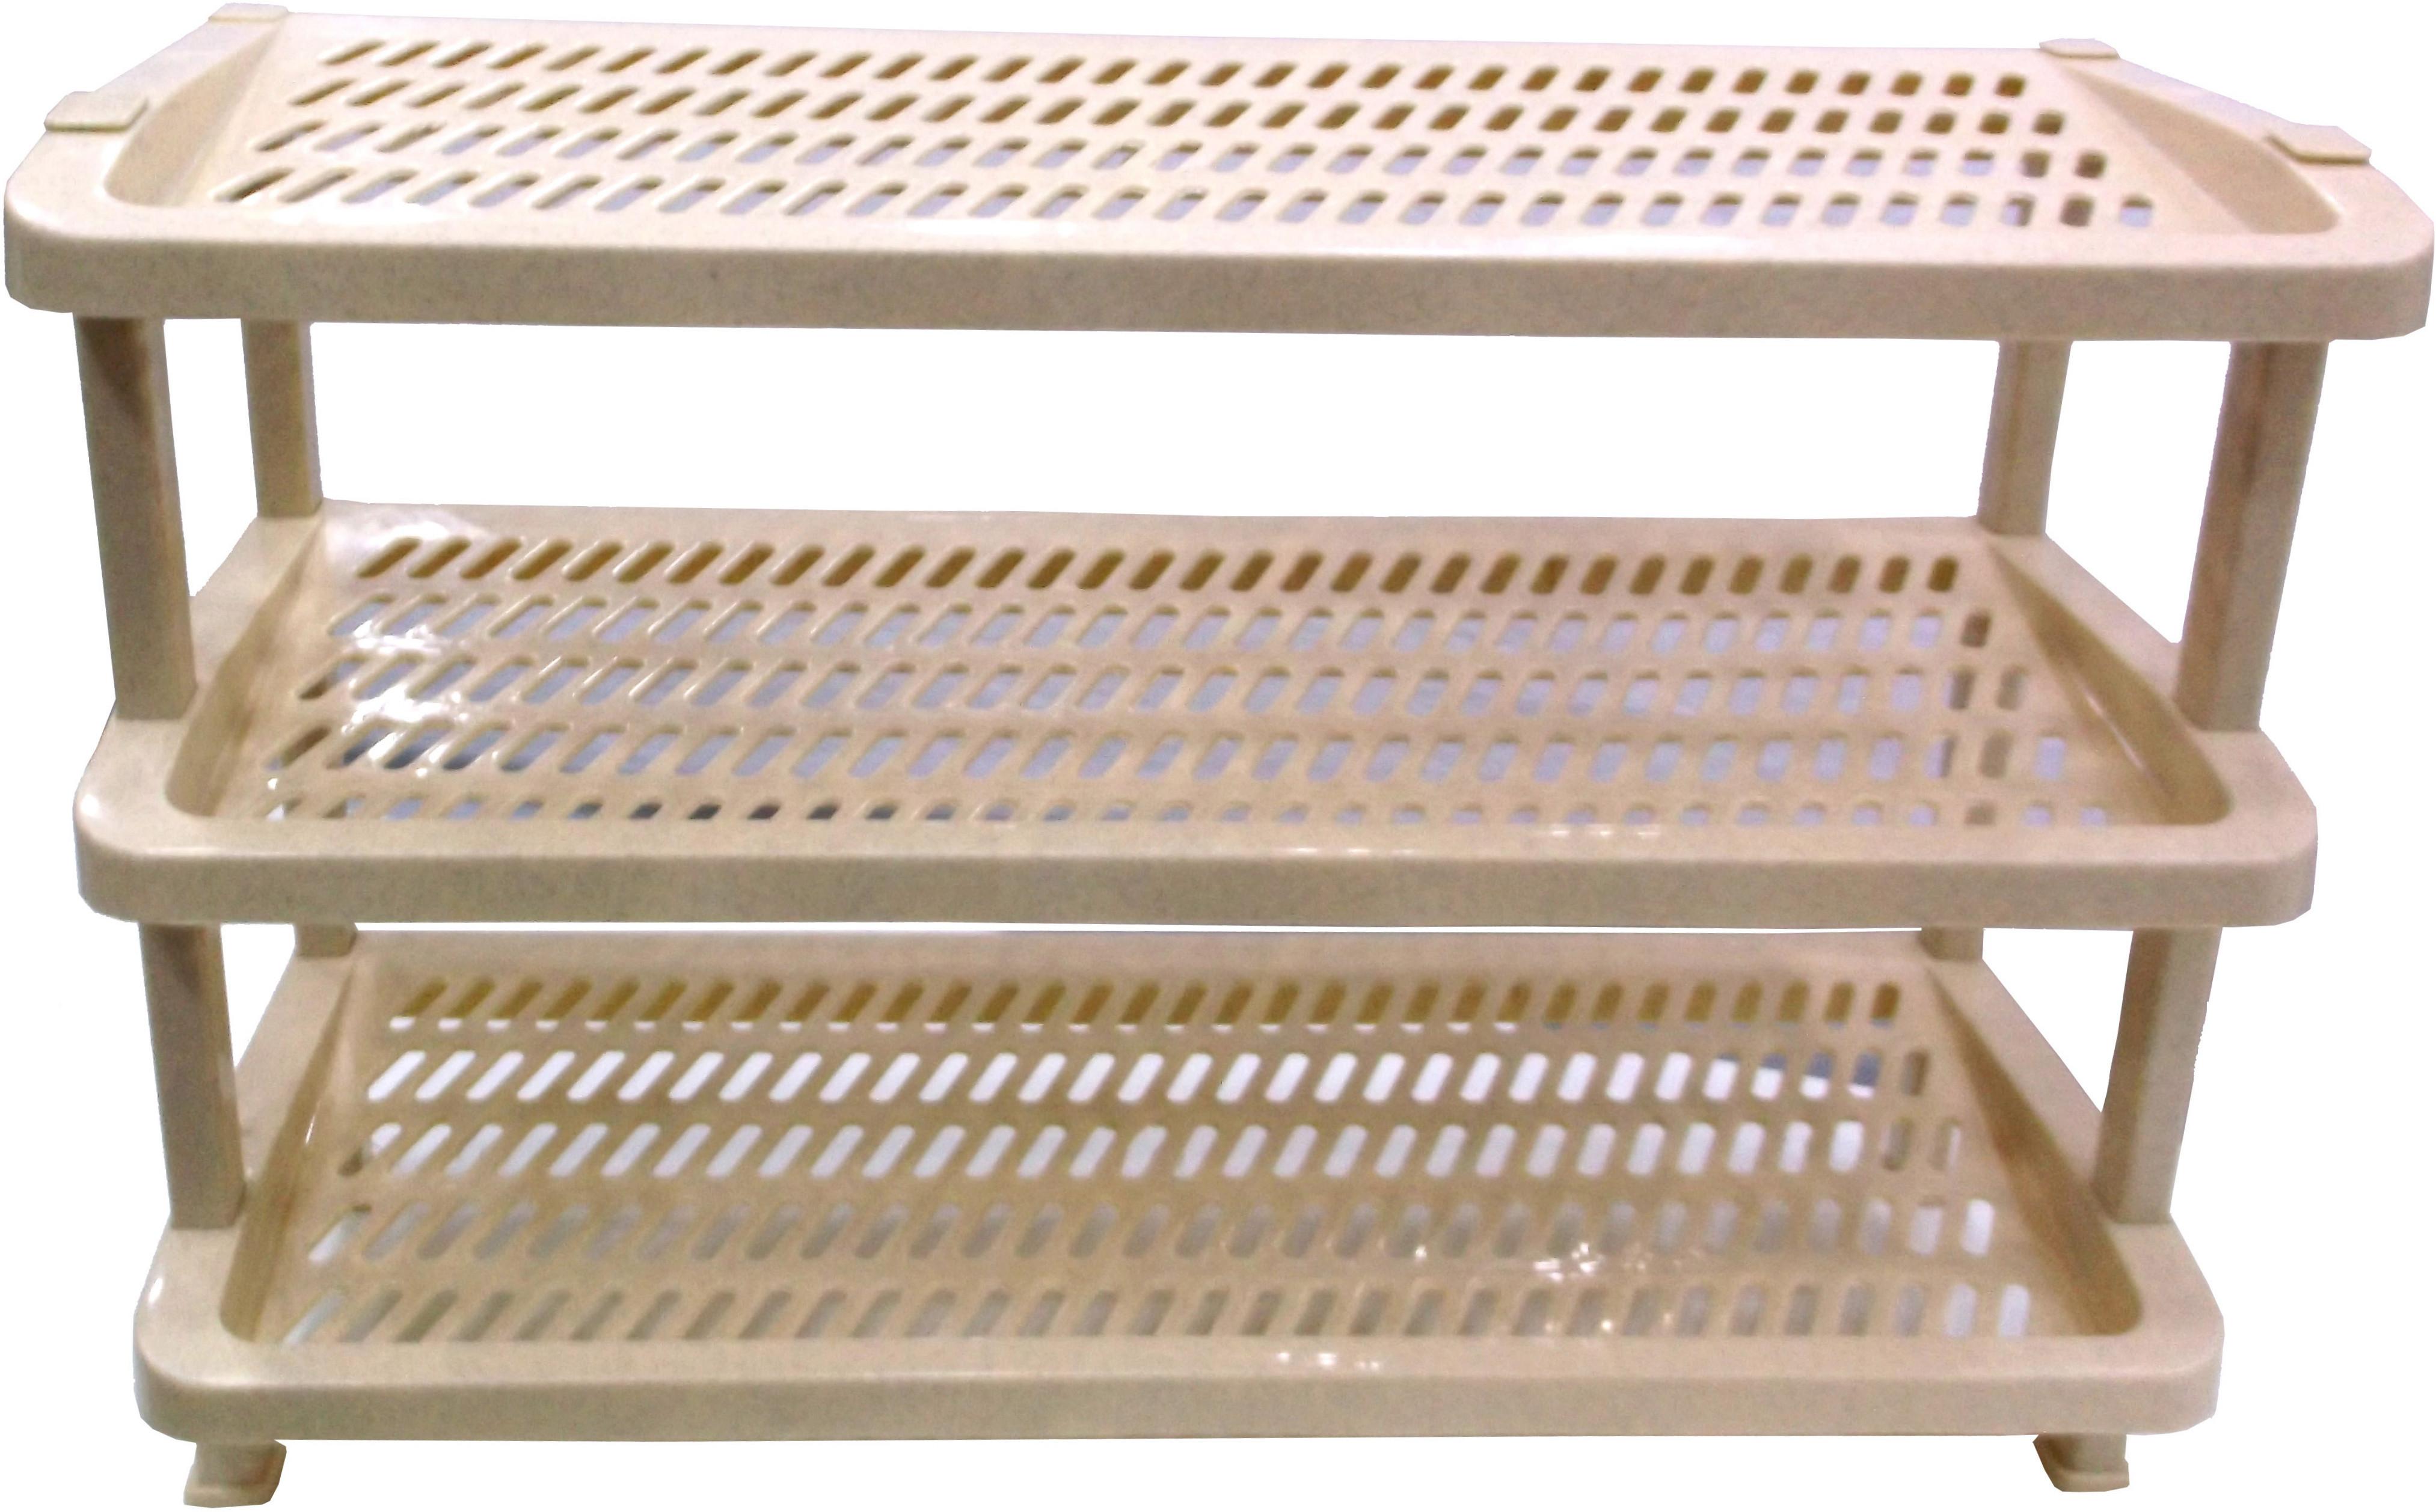 Kitchen Furniture Online India Rk Shoerack 3 Steps Plastic Standard Shoe Rack Price In